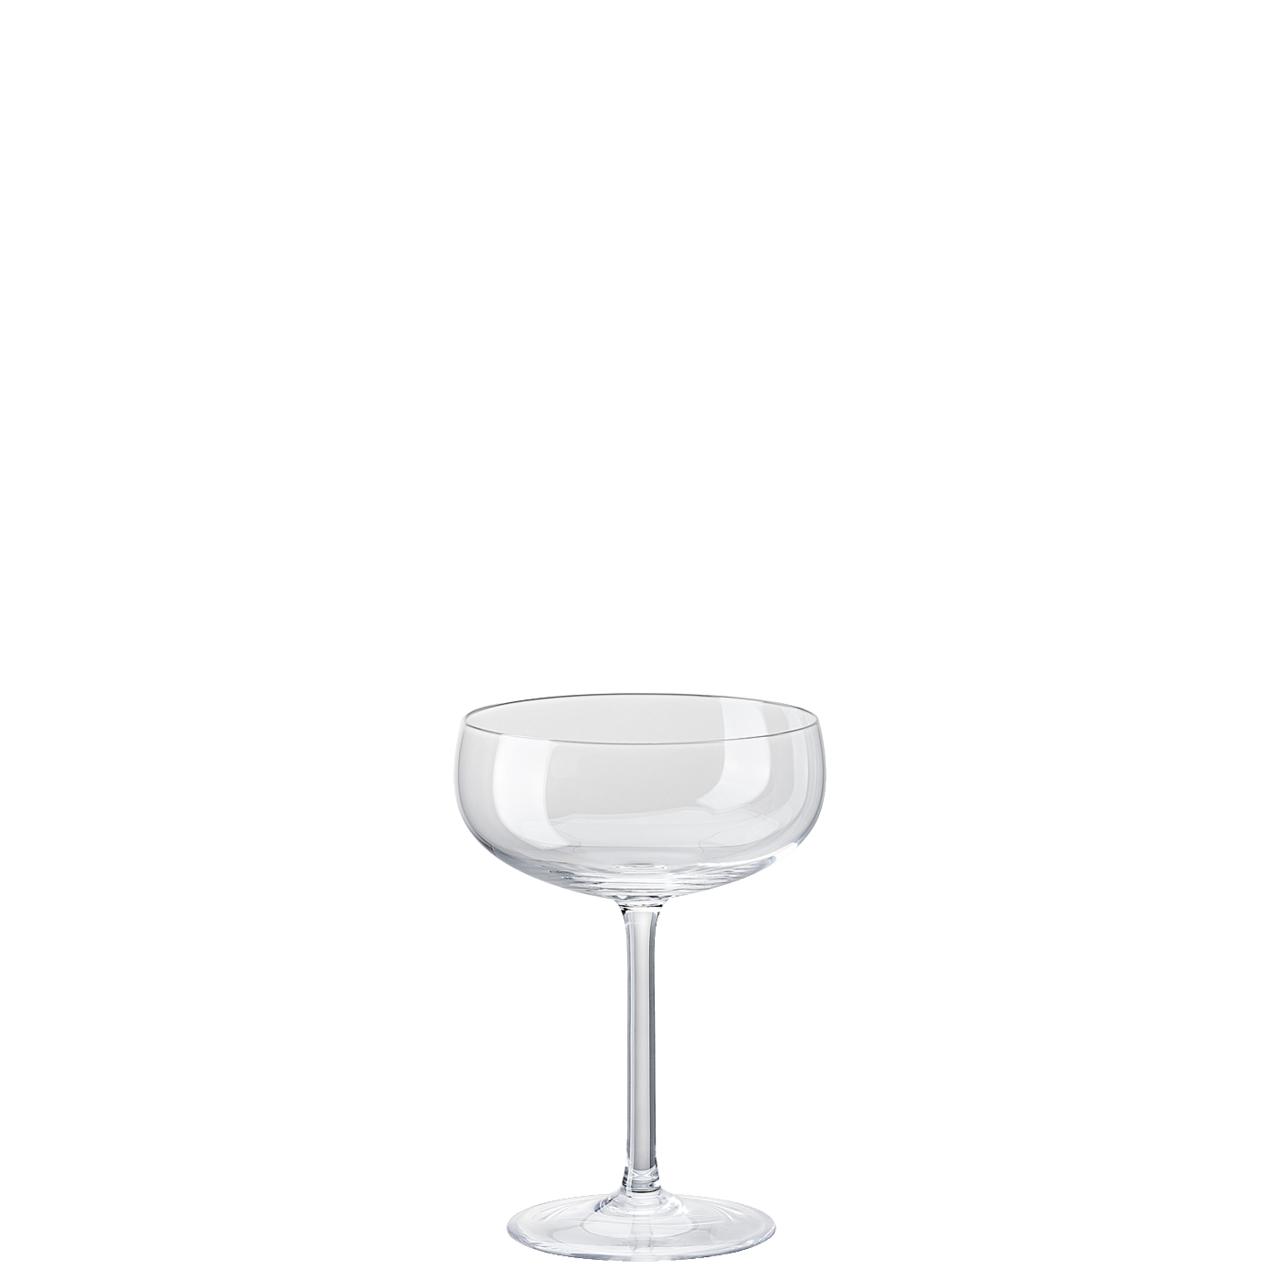 Champagnerschale Turandot Klar Rosenthal